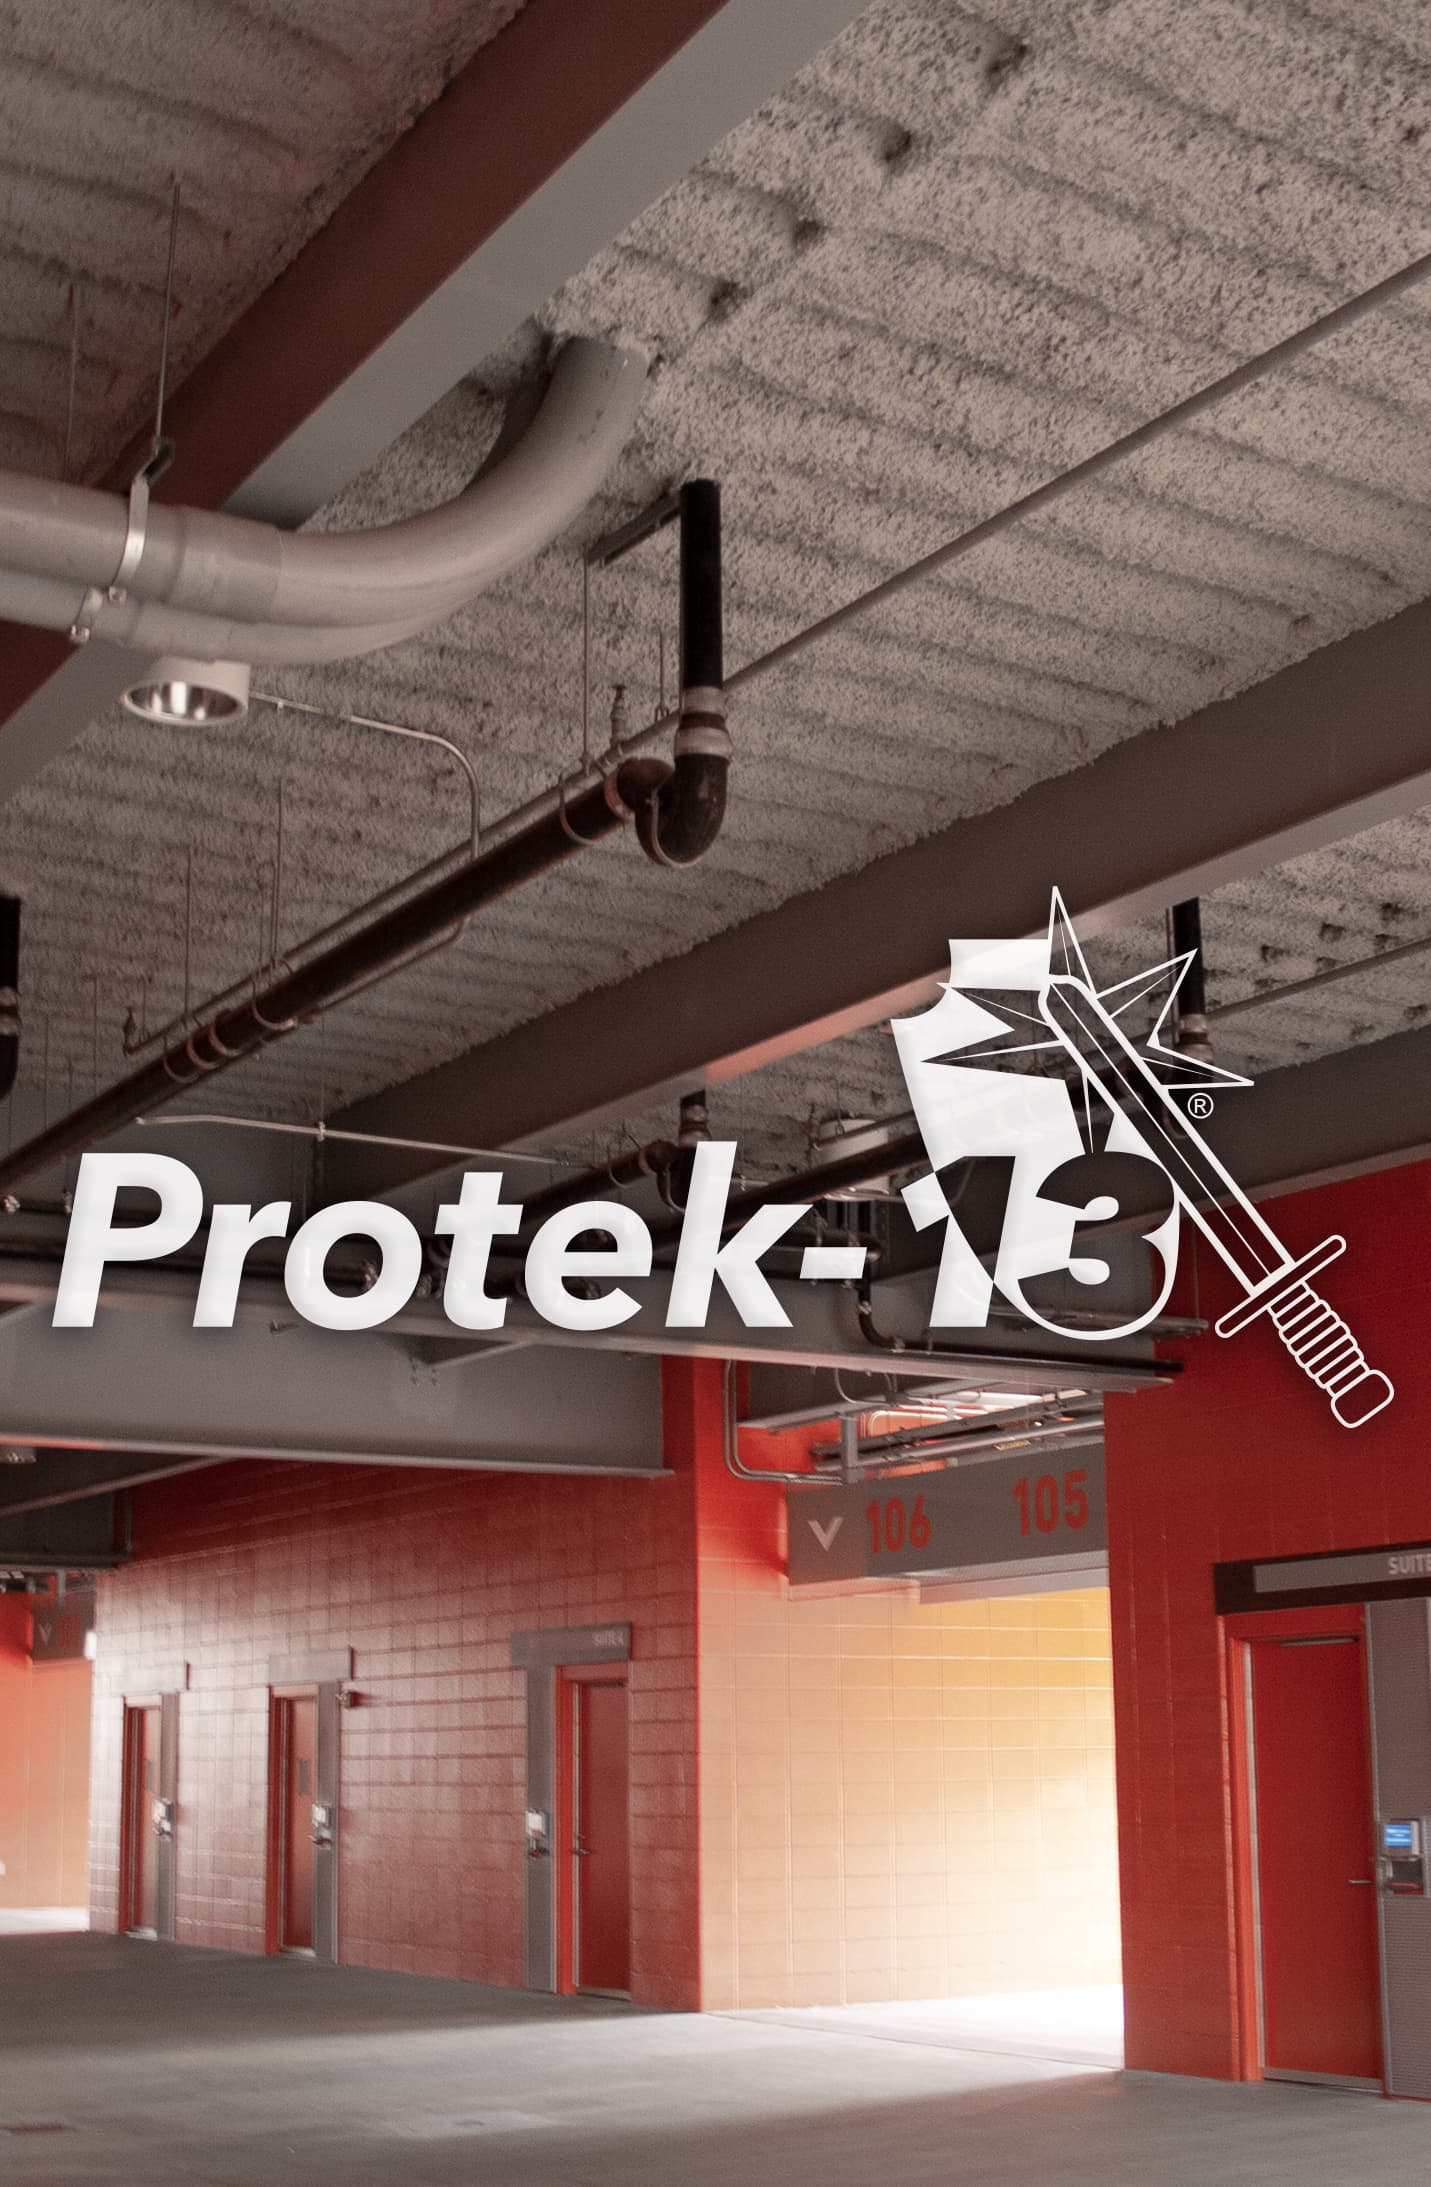 Protek-13 Protective Coating